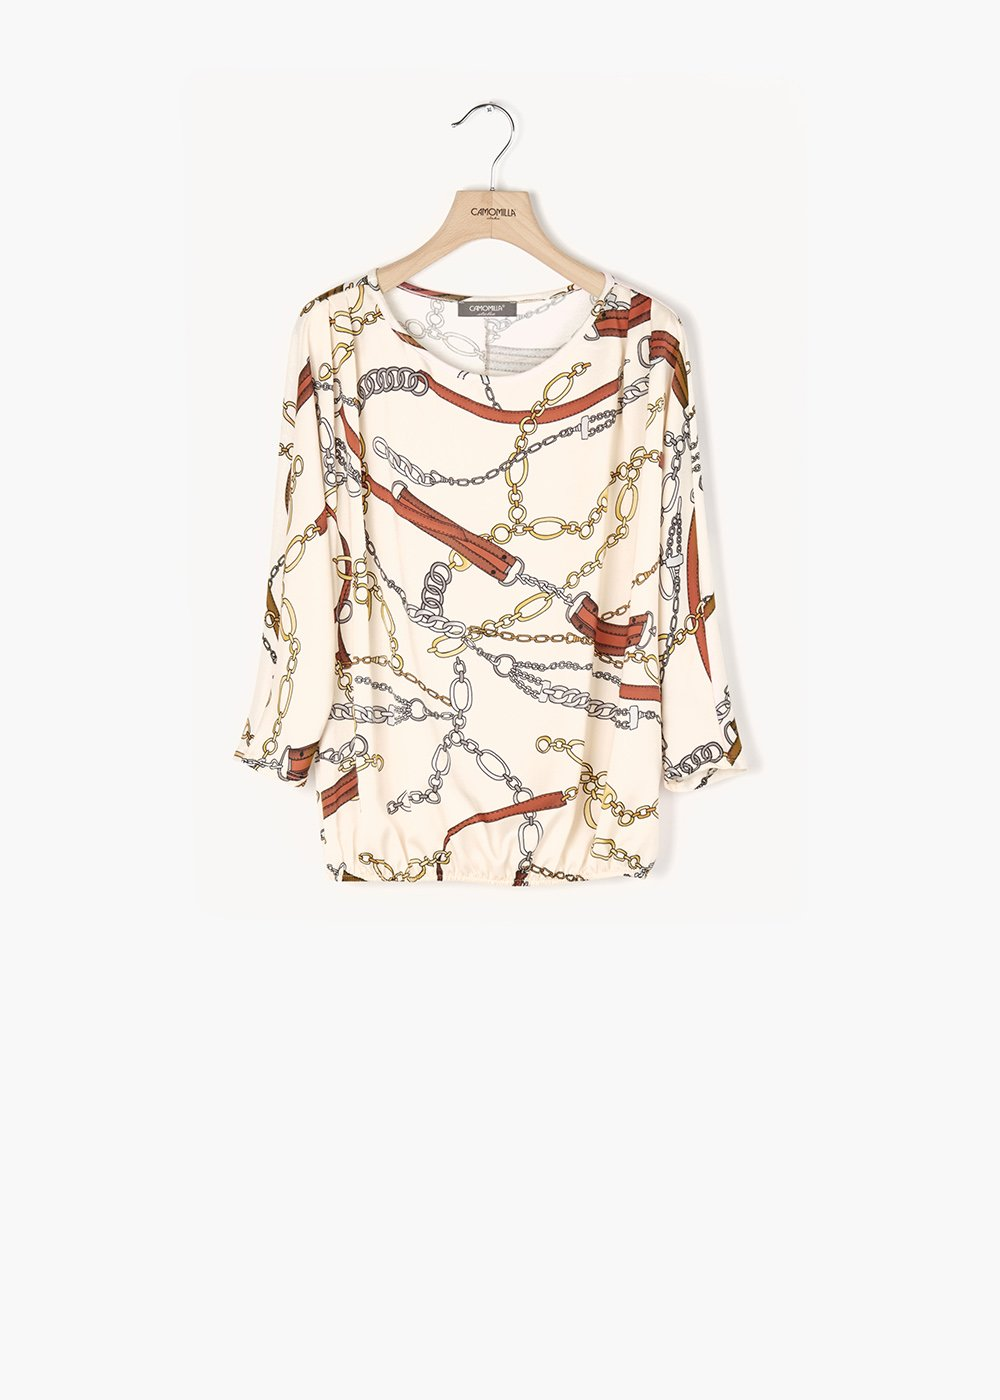 Chiara shirt with printed chains and buckles - Grezzo /  Sughero Fantasia - Woman